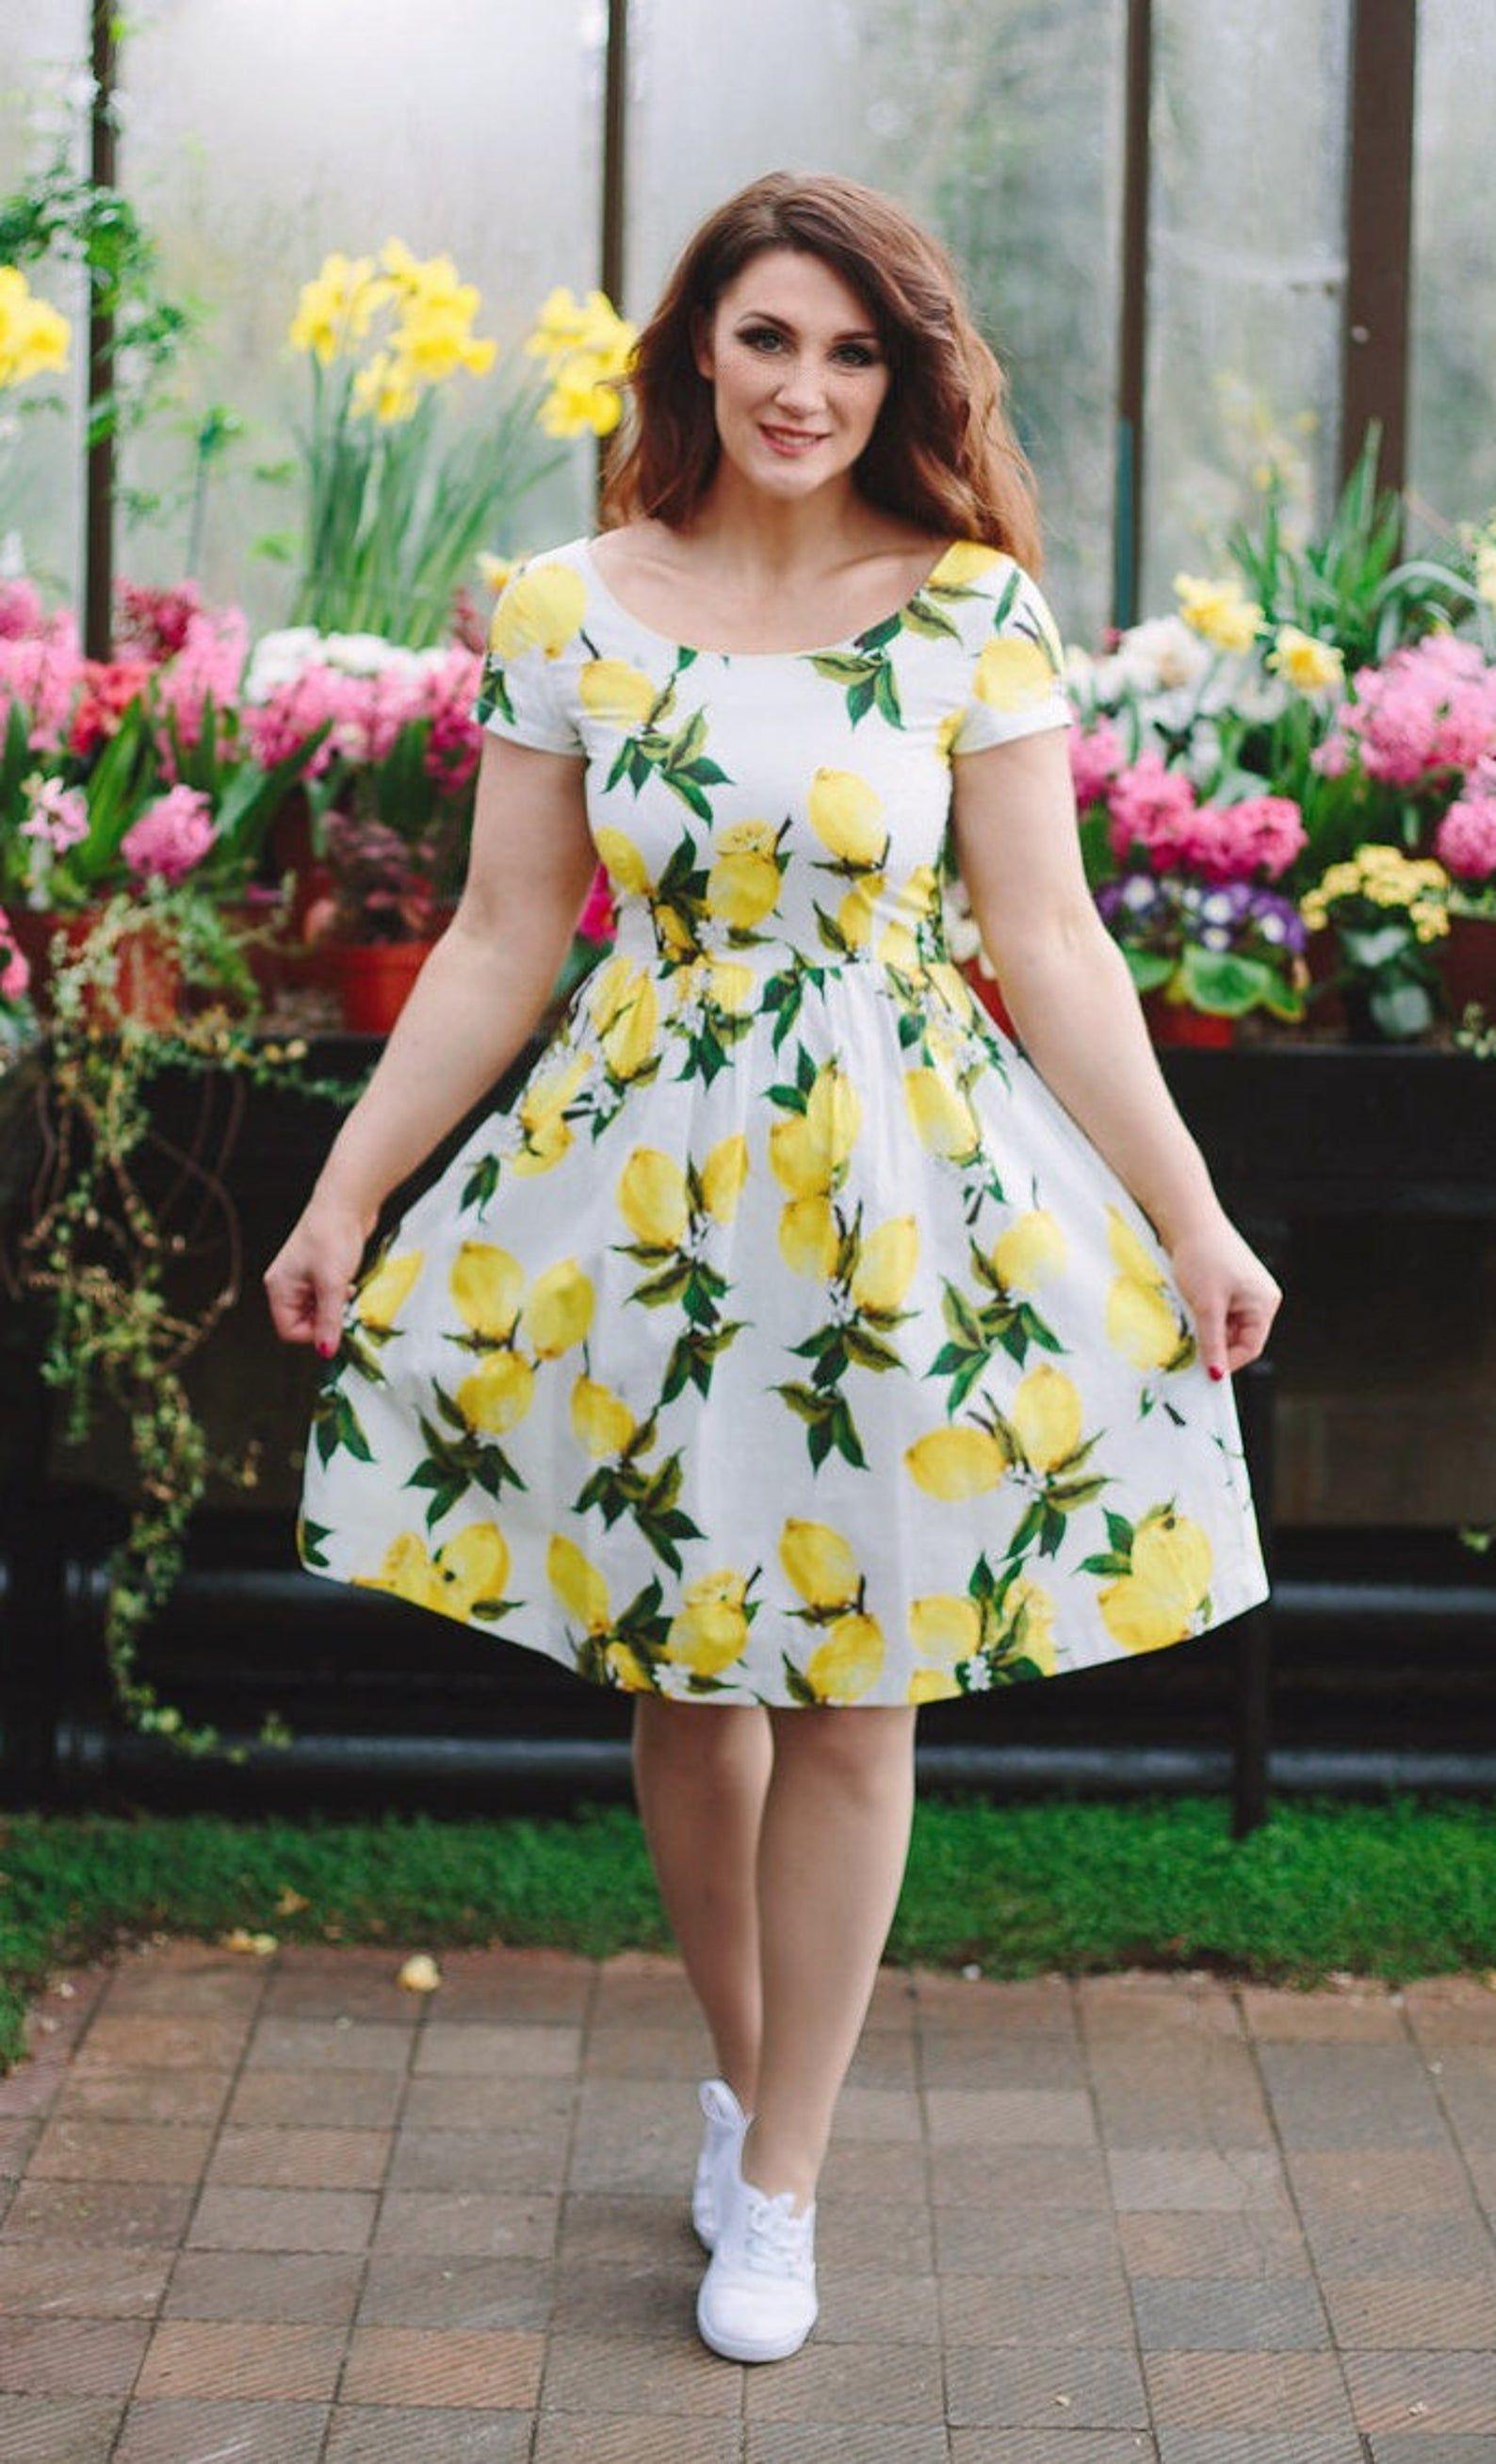 Lemon Print Tea Dress Floral Dress Vintage Style Dress White Summer Garden Party Dress Boat Neck Dress Wedding Dress Bridesmaid Dress Wedding Dresses Blush Wedding Dresses Unique Ball Gown Wedding Dress [ 2615 x 1588 Pixel ]